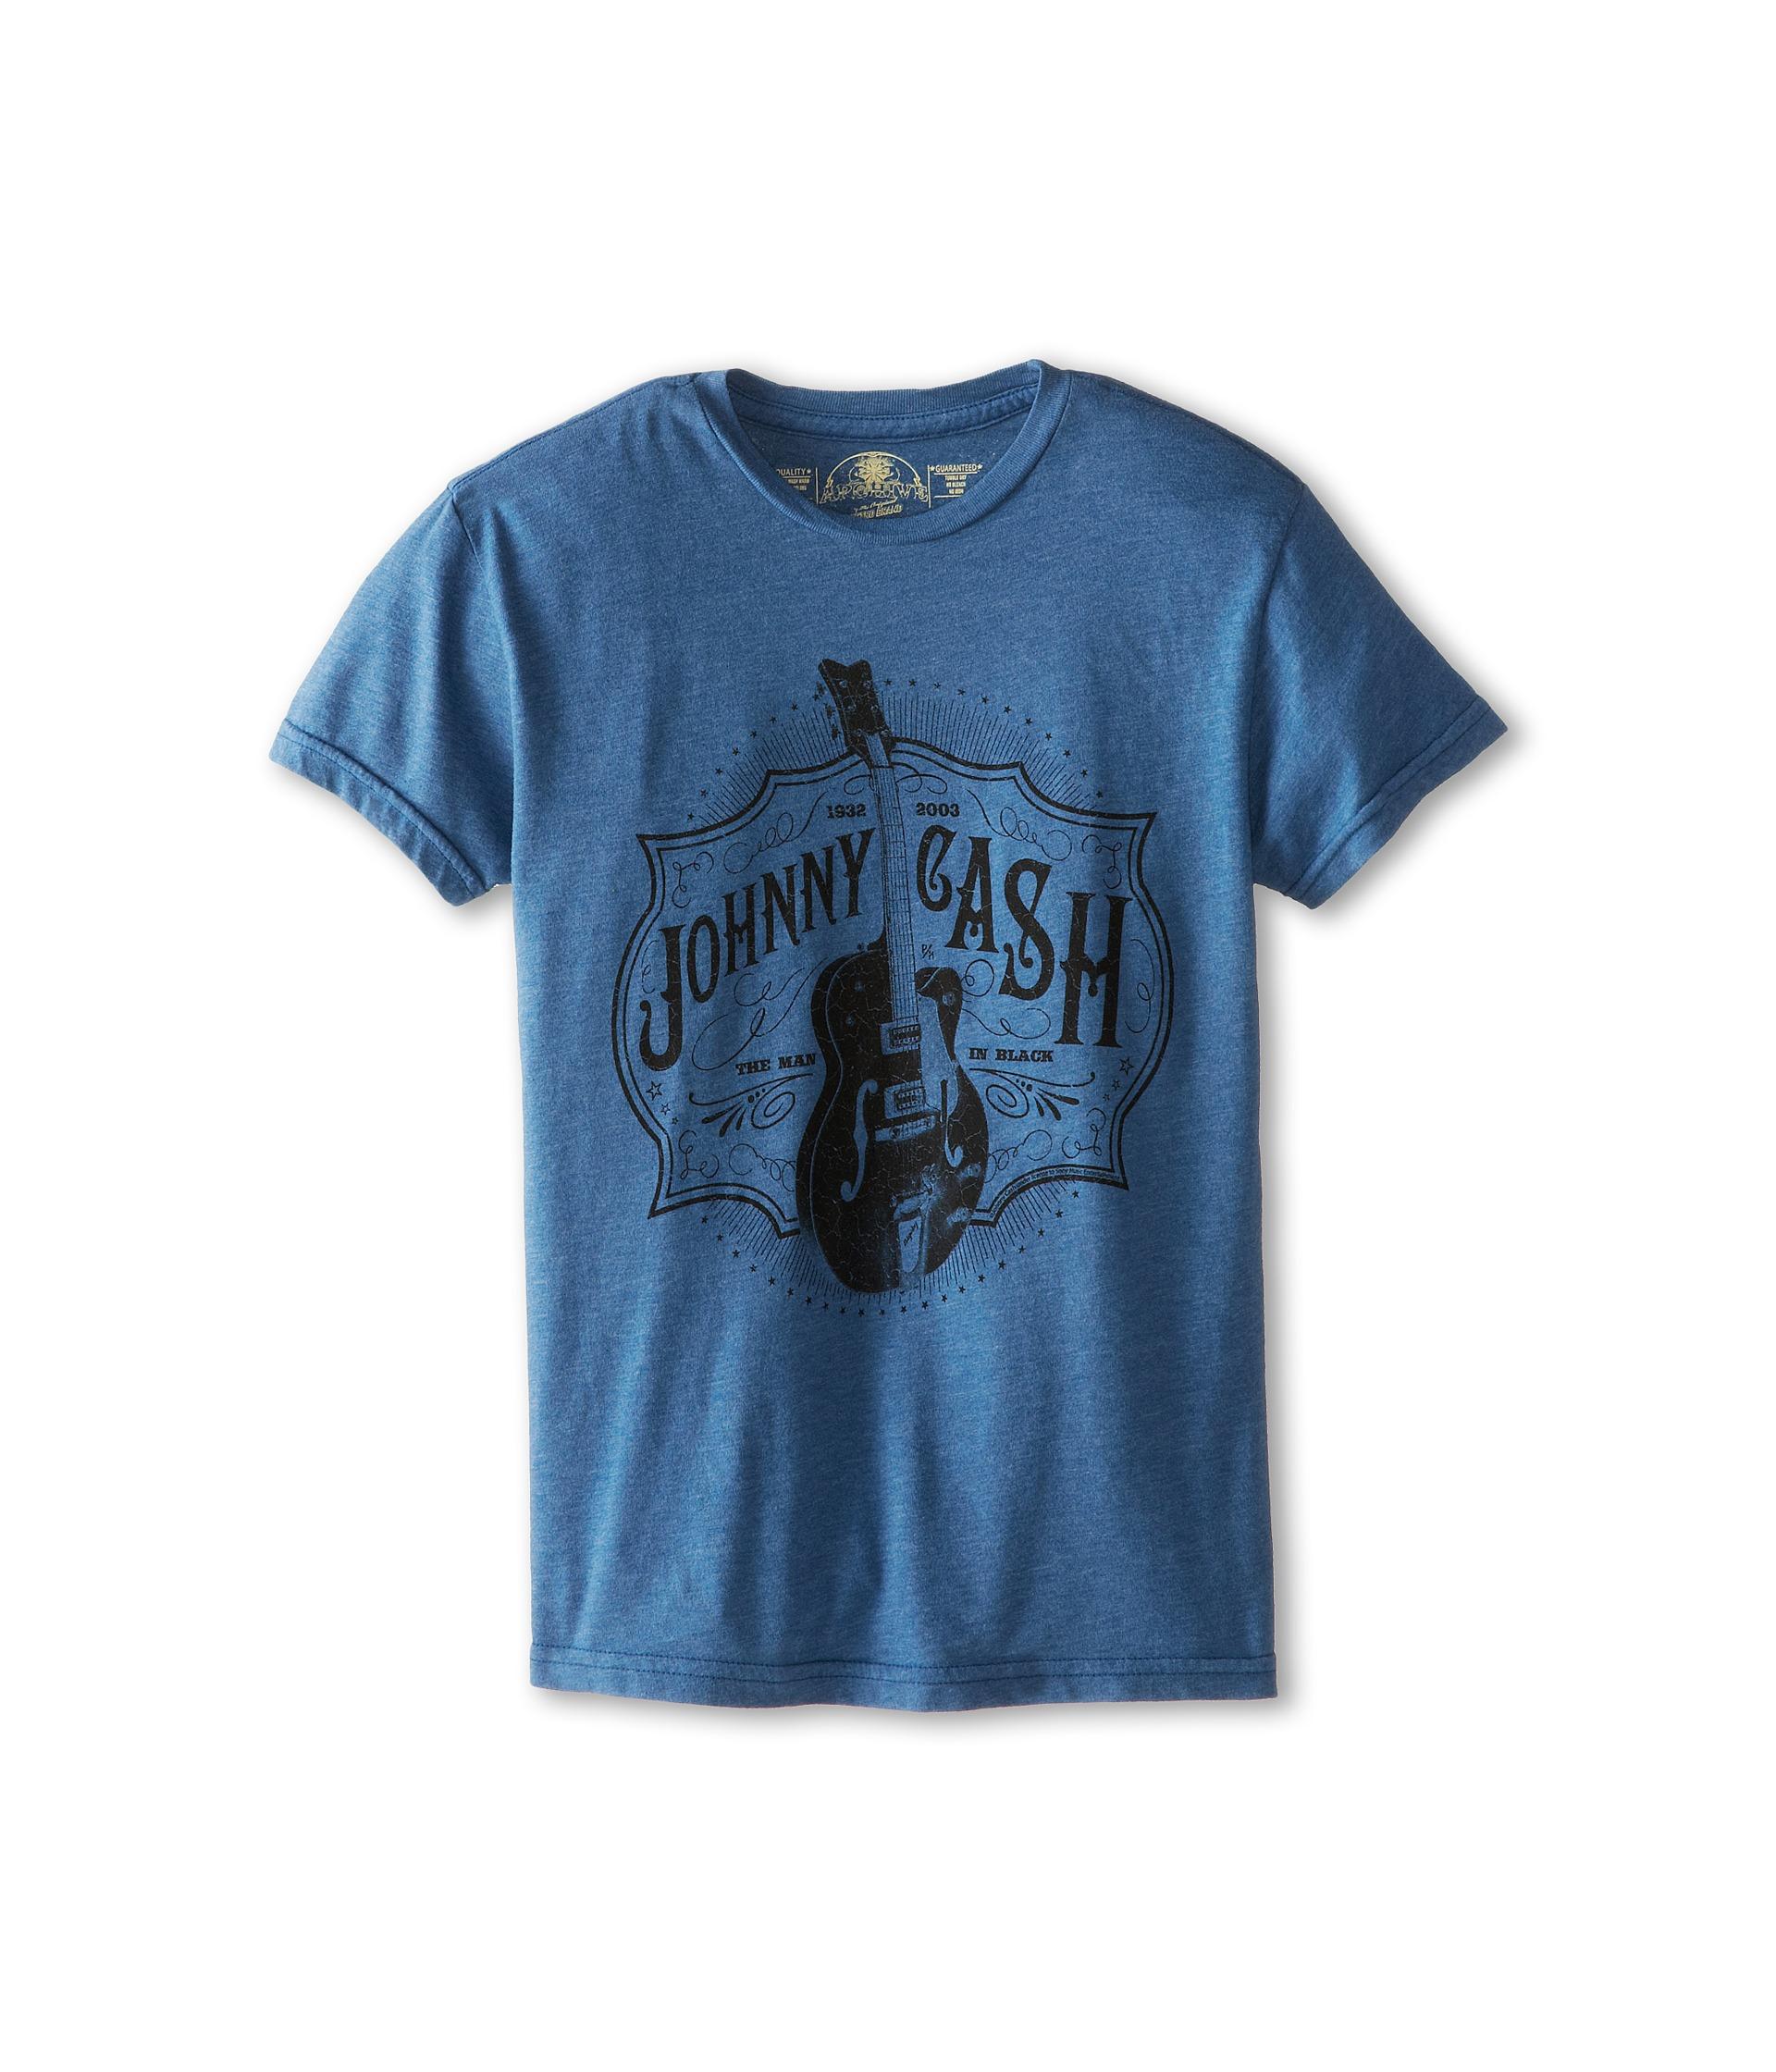 The Original Retro Brand Kids Johnny Cash Heathered Tee (Big Kids) Heather Blue